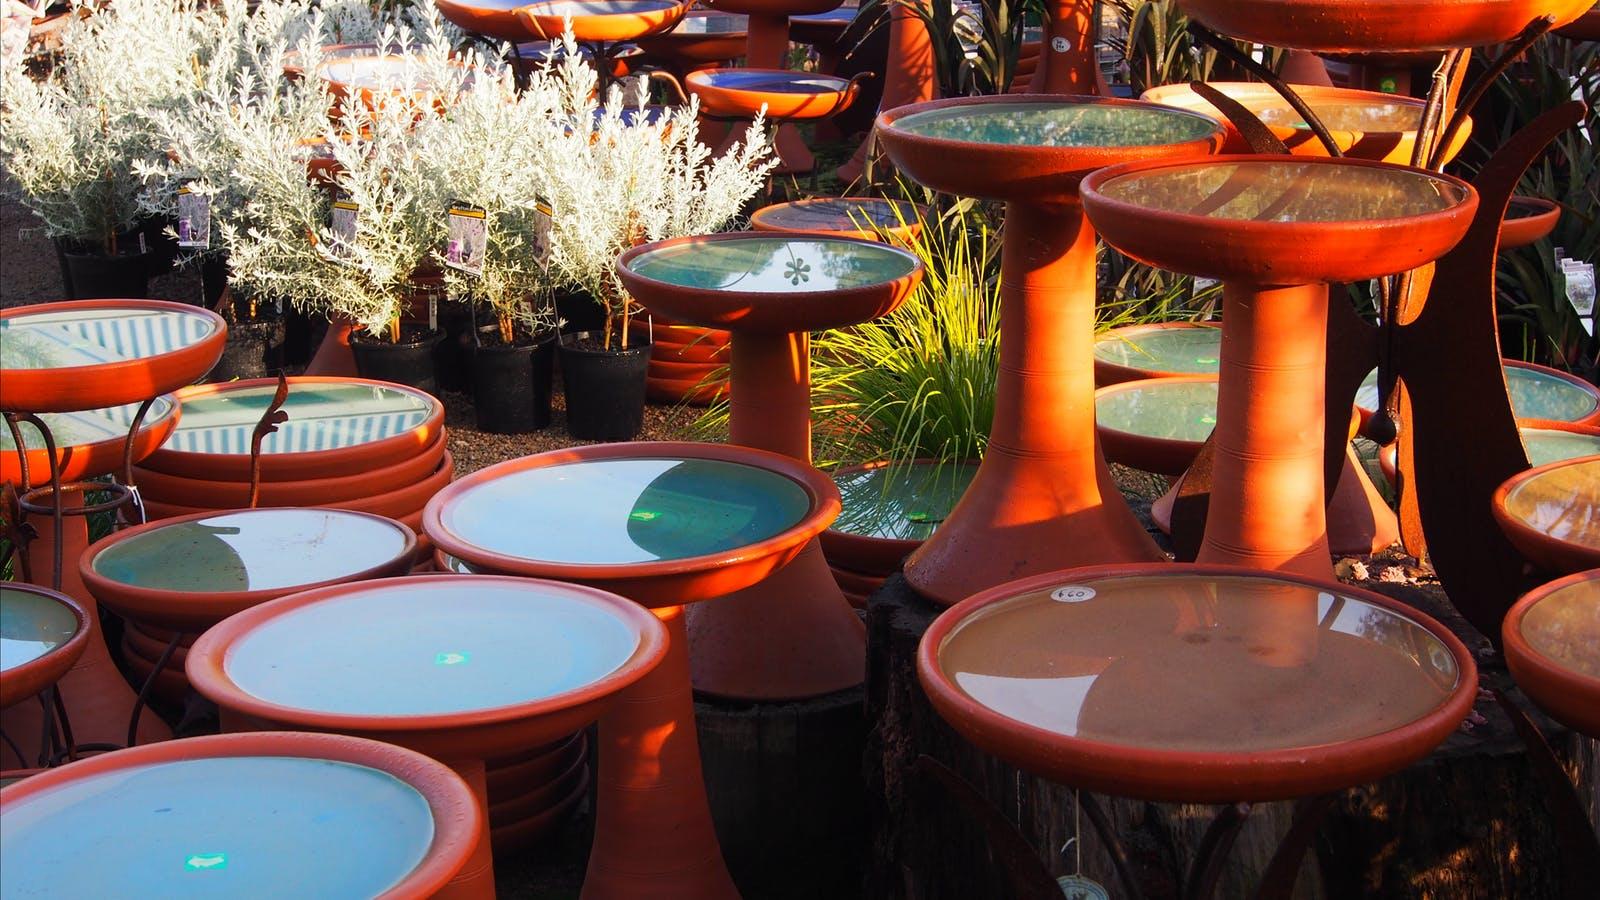 Bird baths, water bowls, bird feeders & nesting boxes